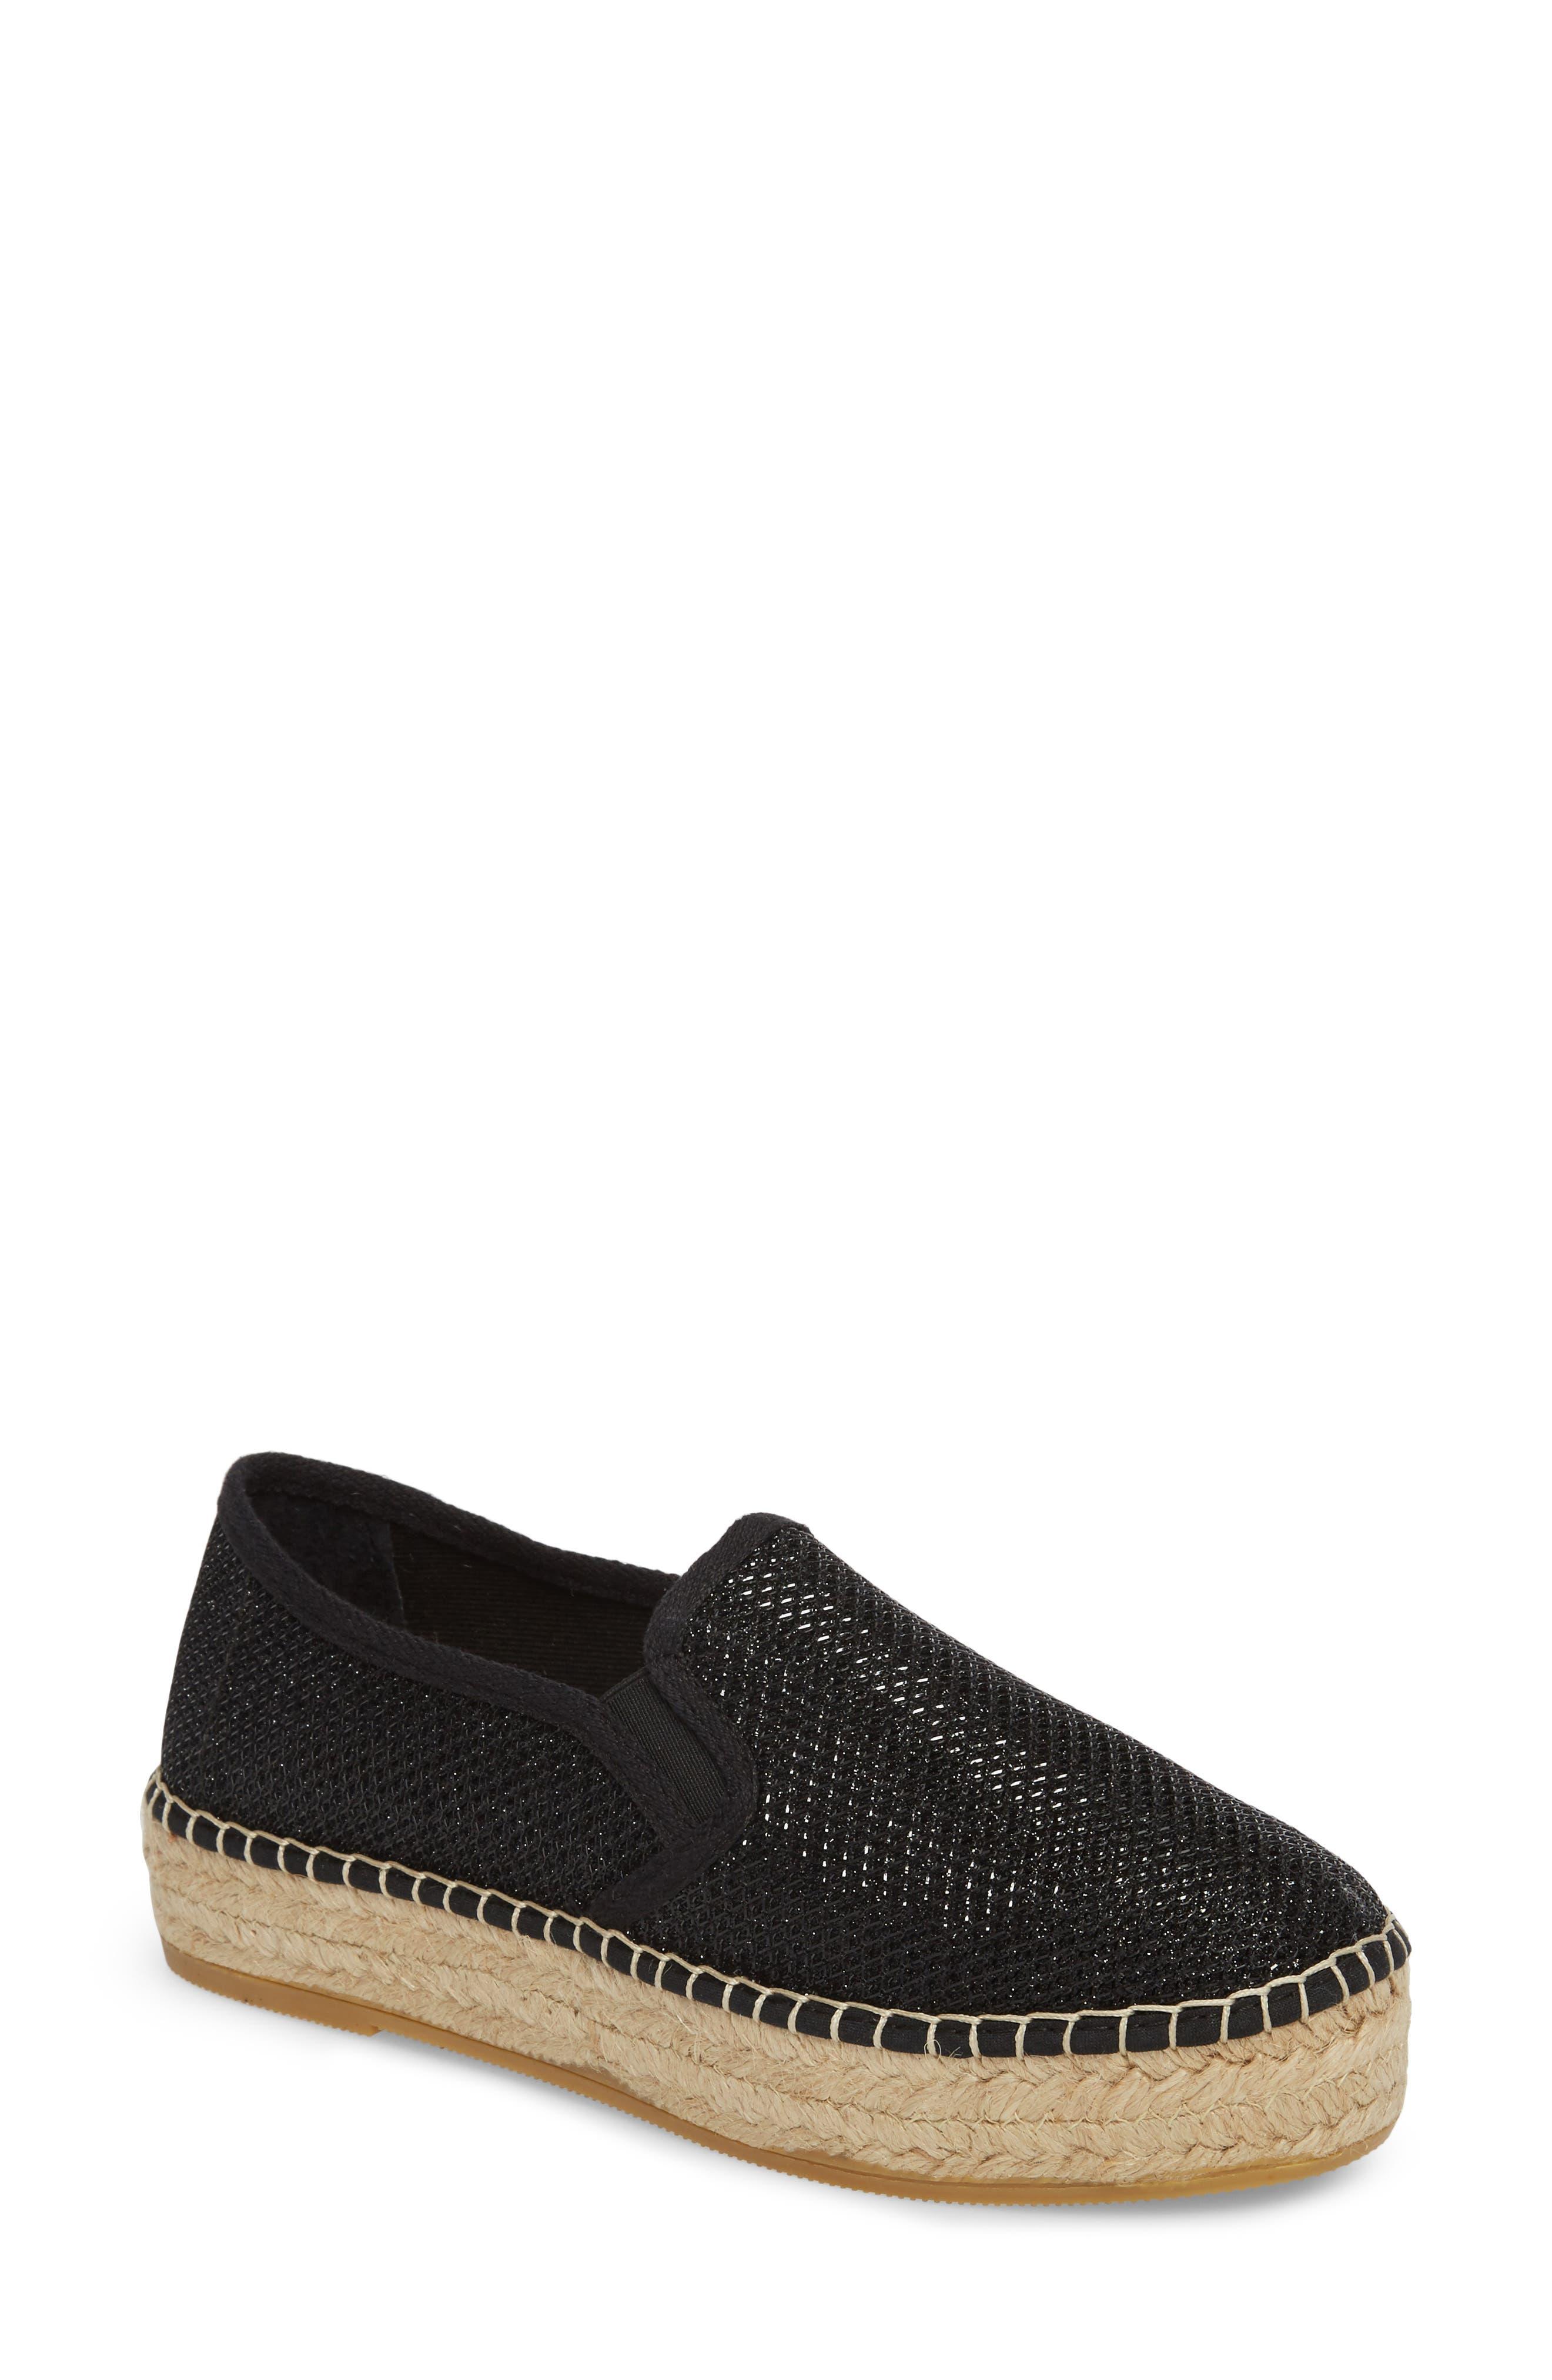 Fonda Platform Espadrille Sneaker,                         Main,                         color, BLACK FABRIC